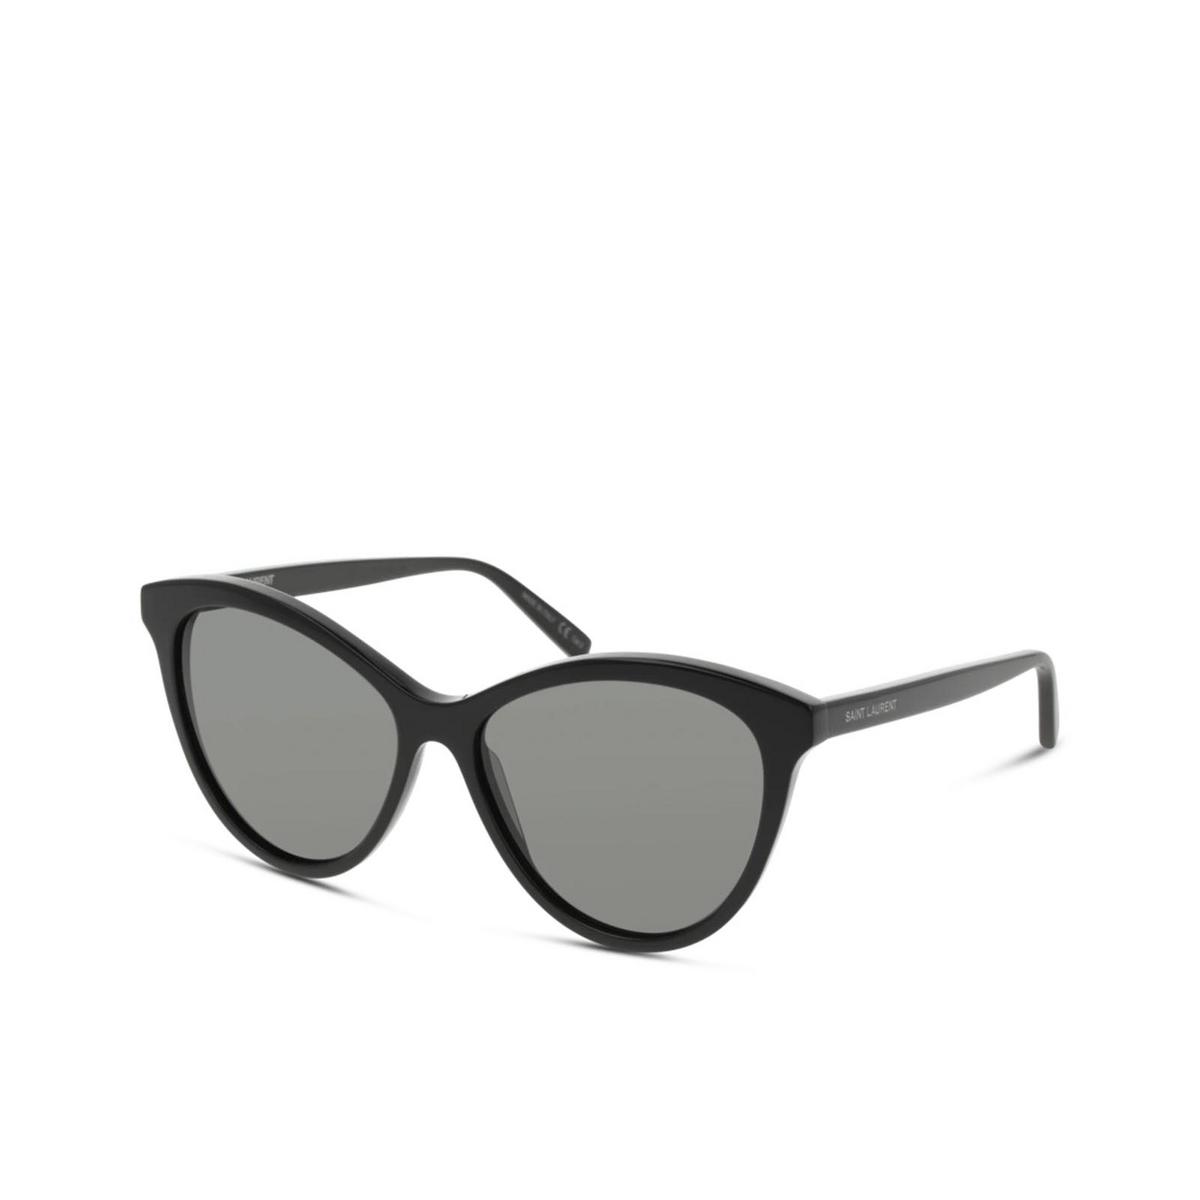 Saint Laurent® Cat-eye Sunglasses: SL 456 color Black 001 - three-quarters view.